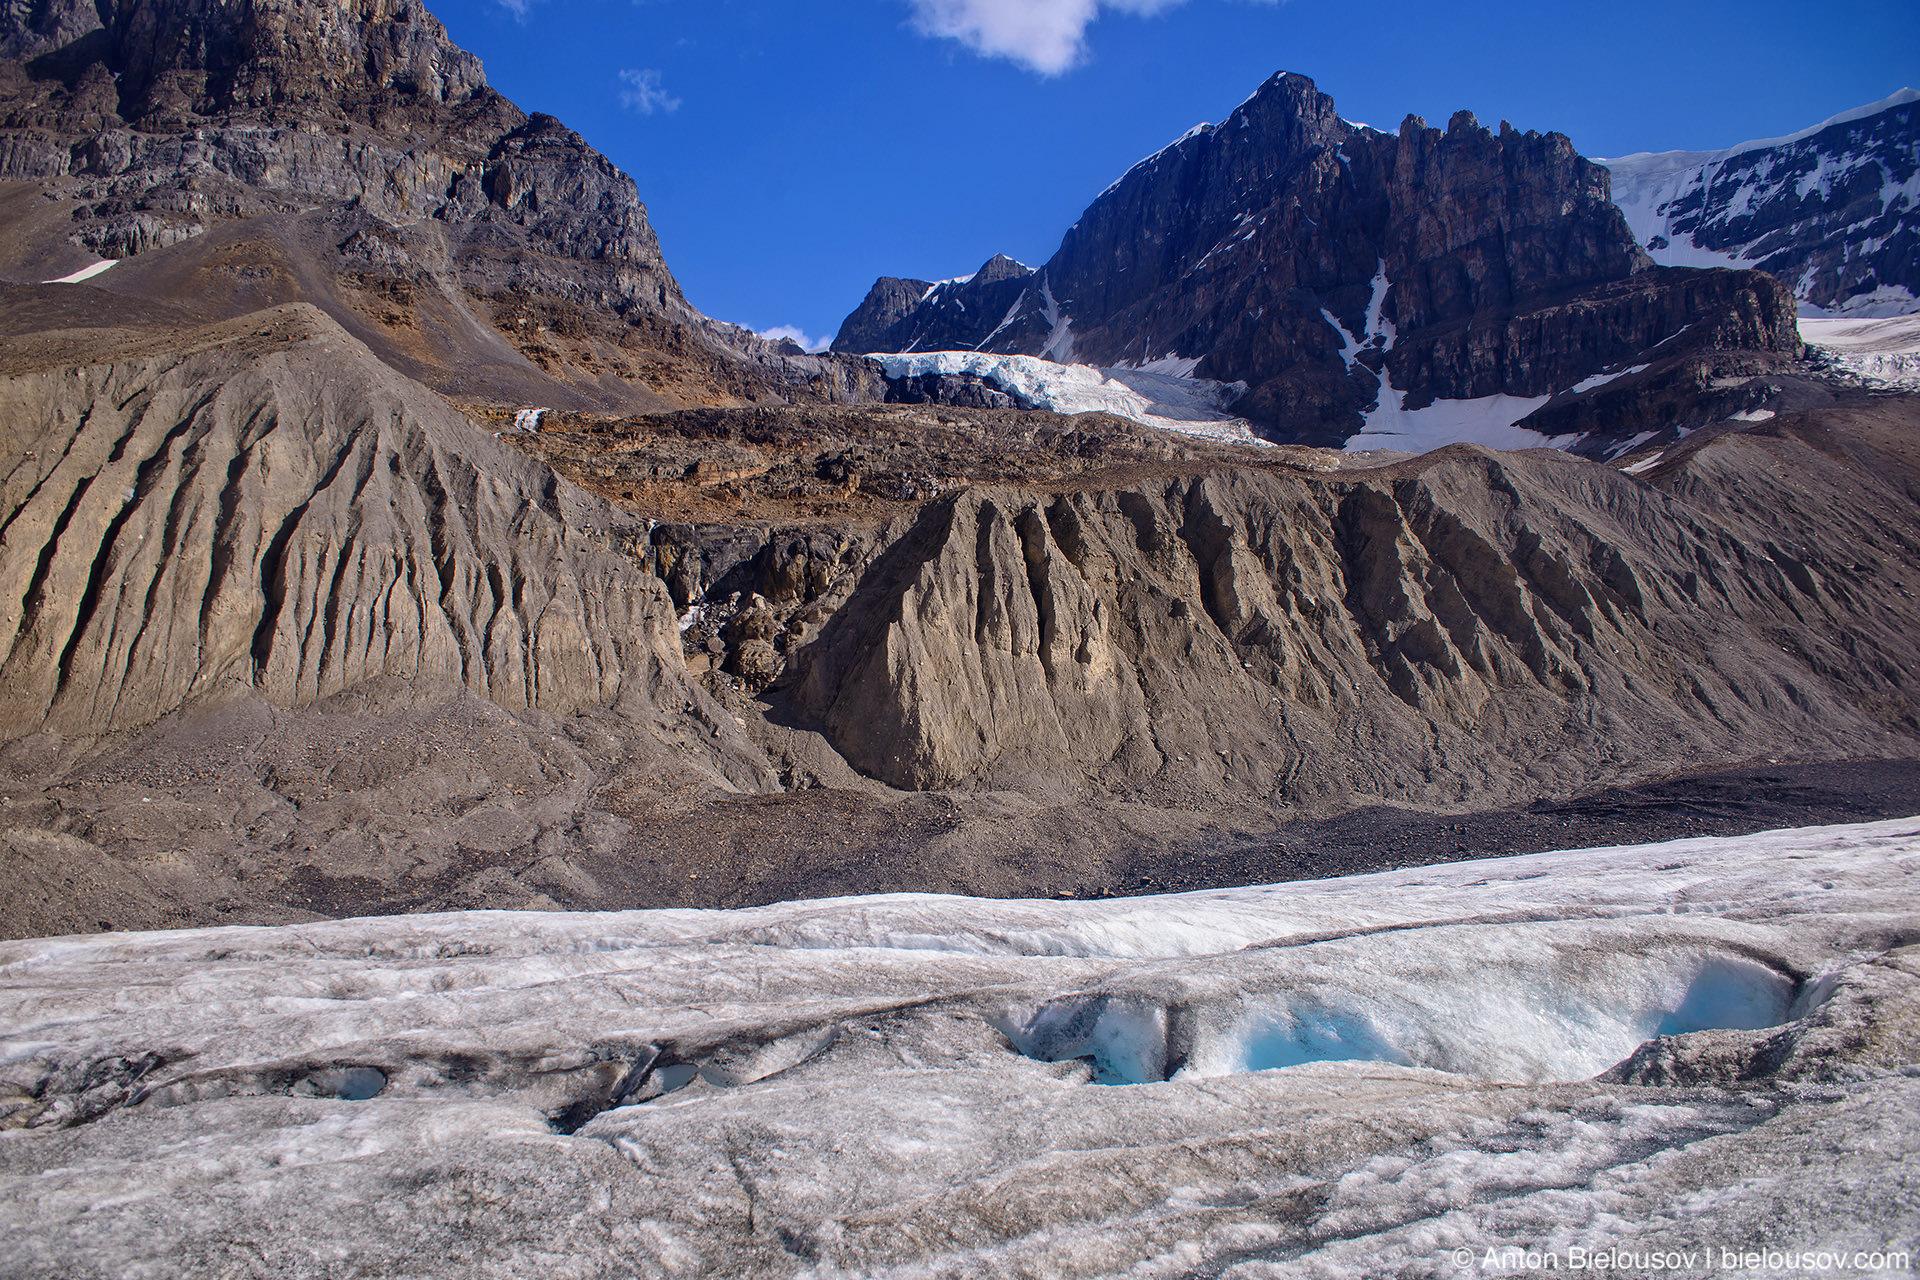 Athabasca Glacier contributing glacier at Andromeda Mountain, Columbia Icefield, Jasper National Park